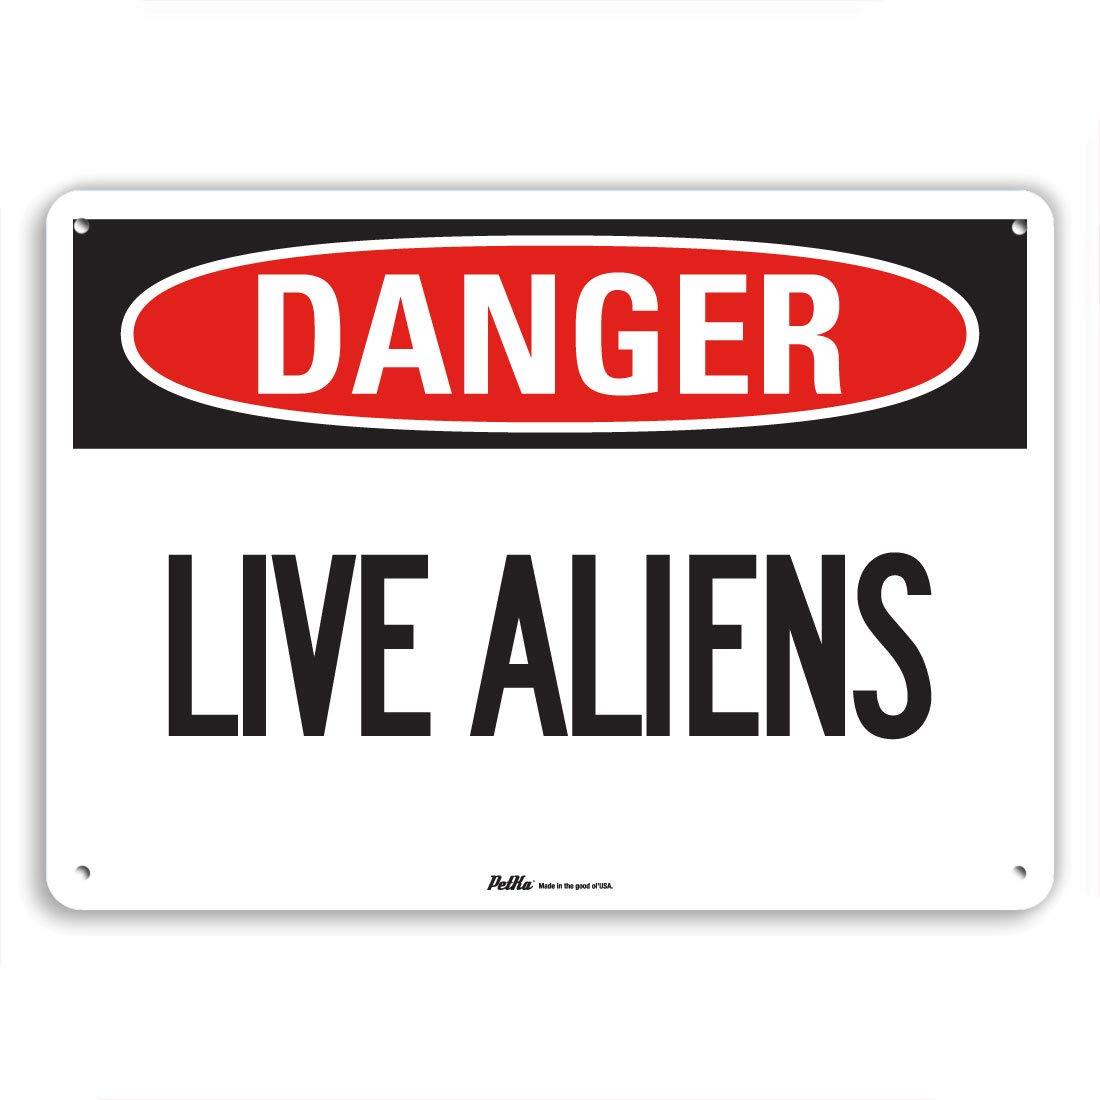 Danger PetKa Signs and Graphics PKFO-0218-NA/_Live Aliens Aluminum Sign 10 x 7